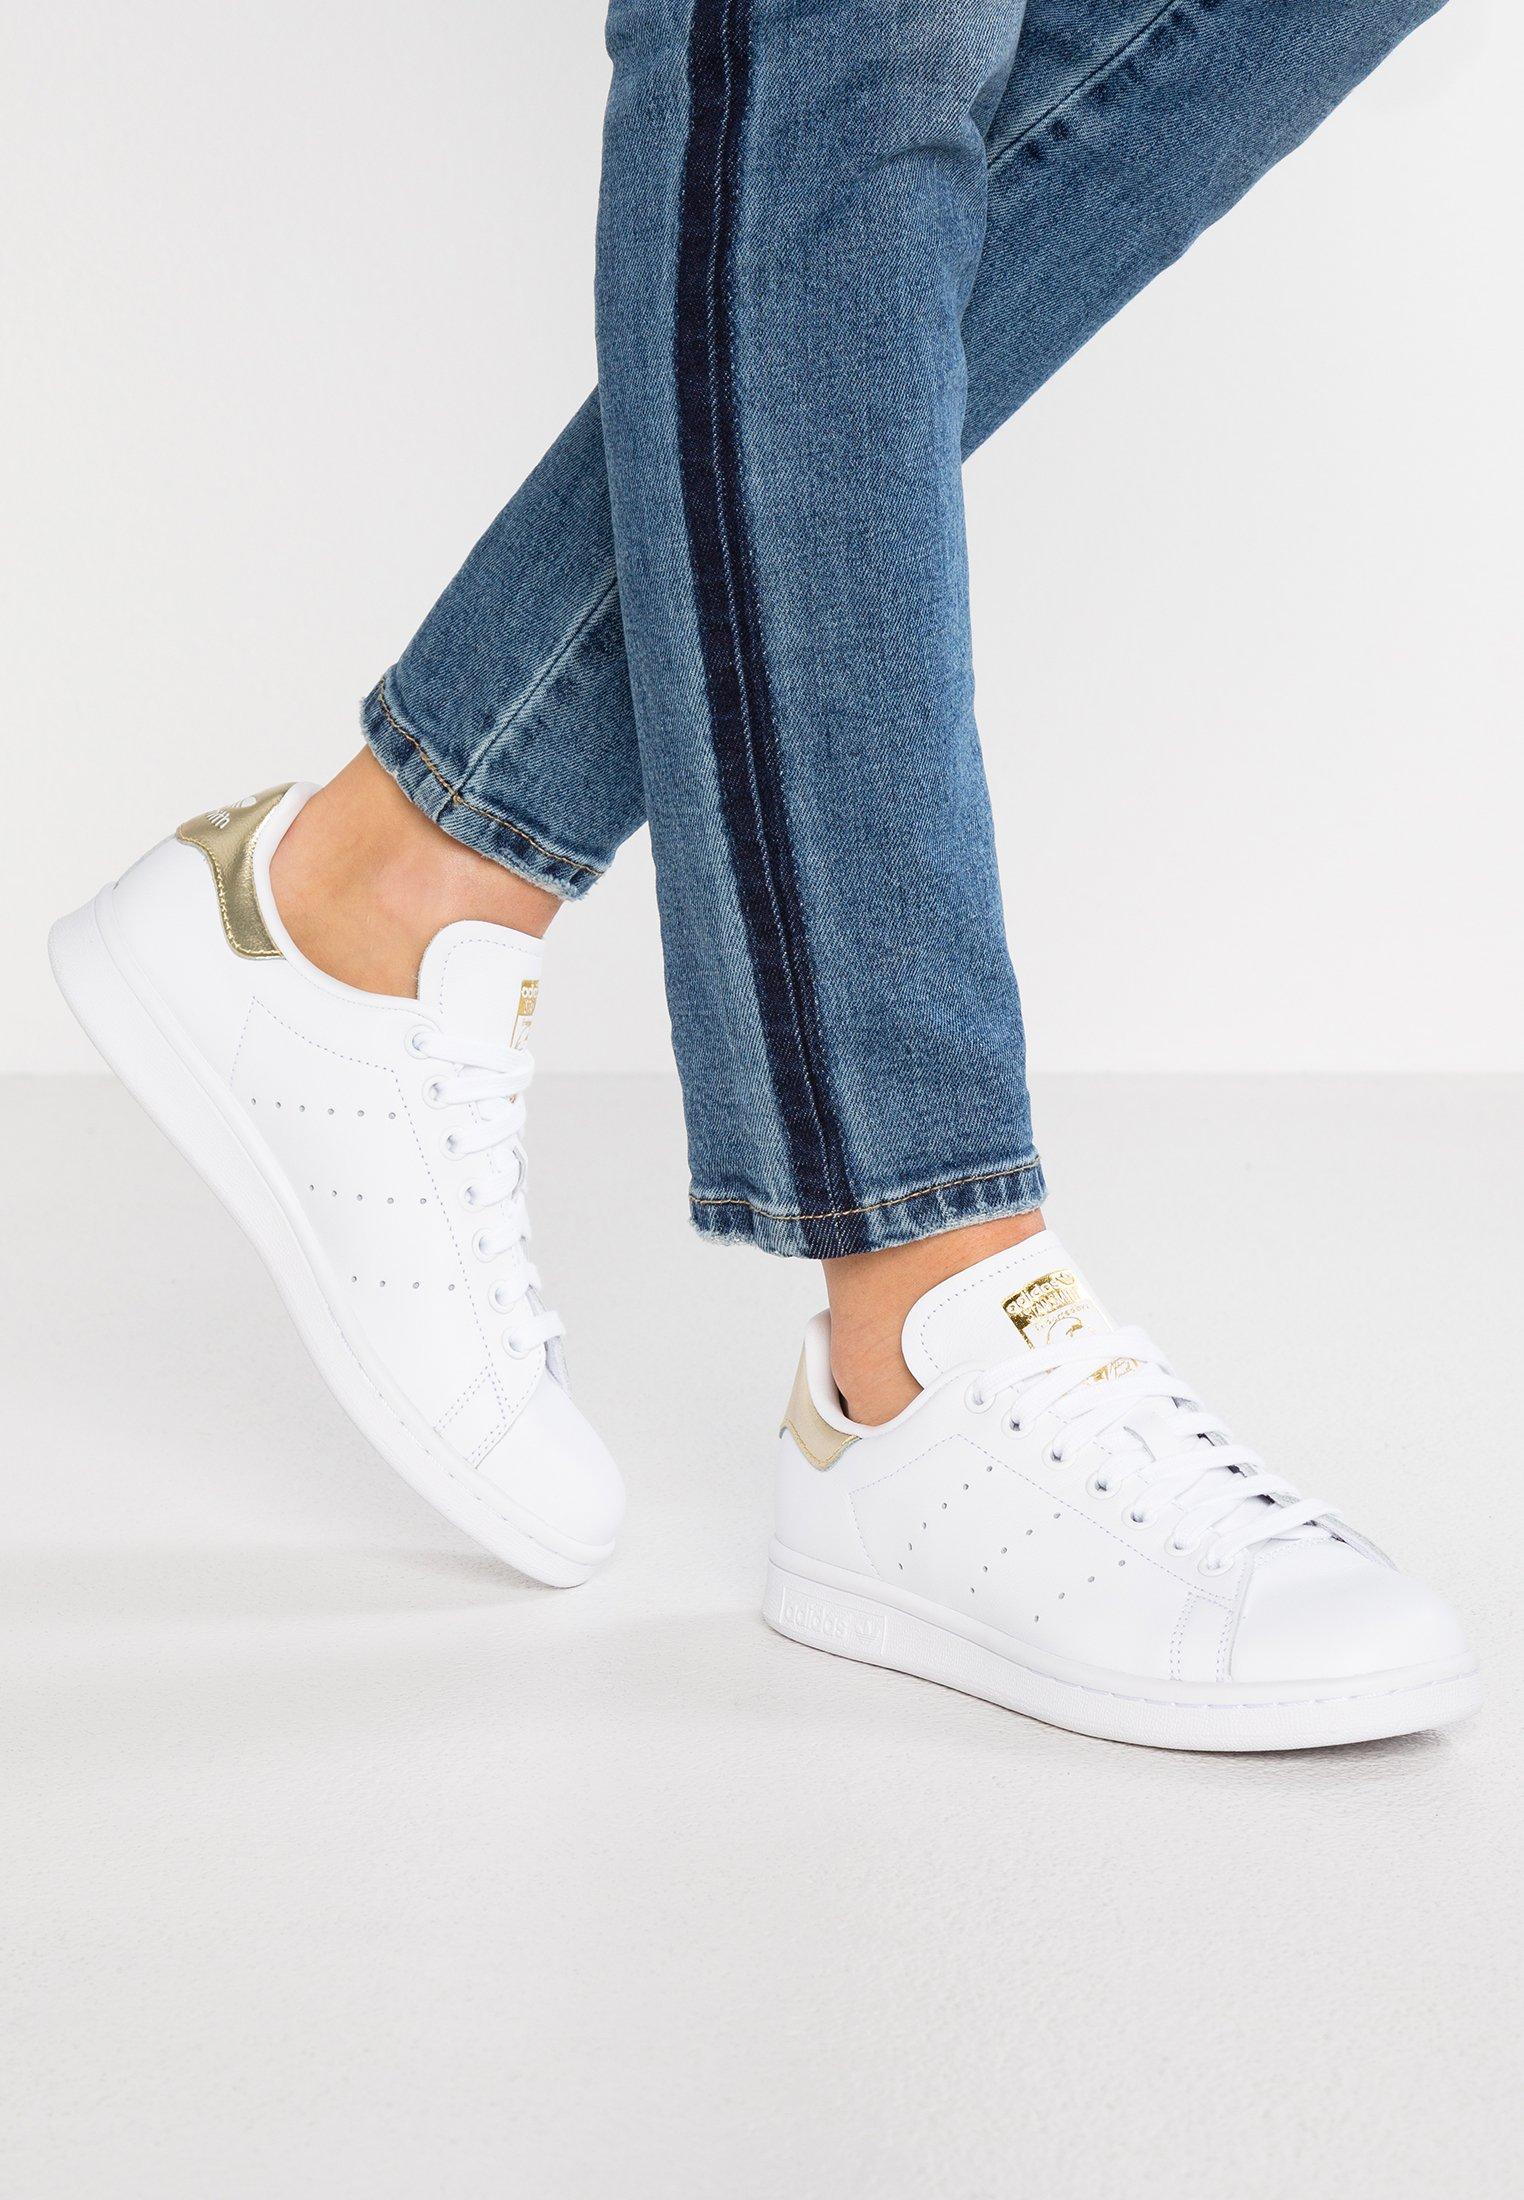 Soldes > chaussure femme adidas blanche > en stock